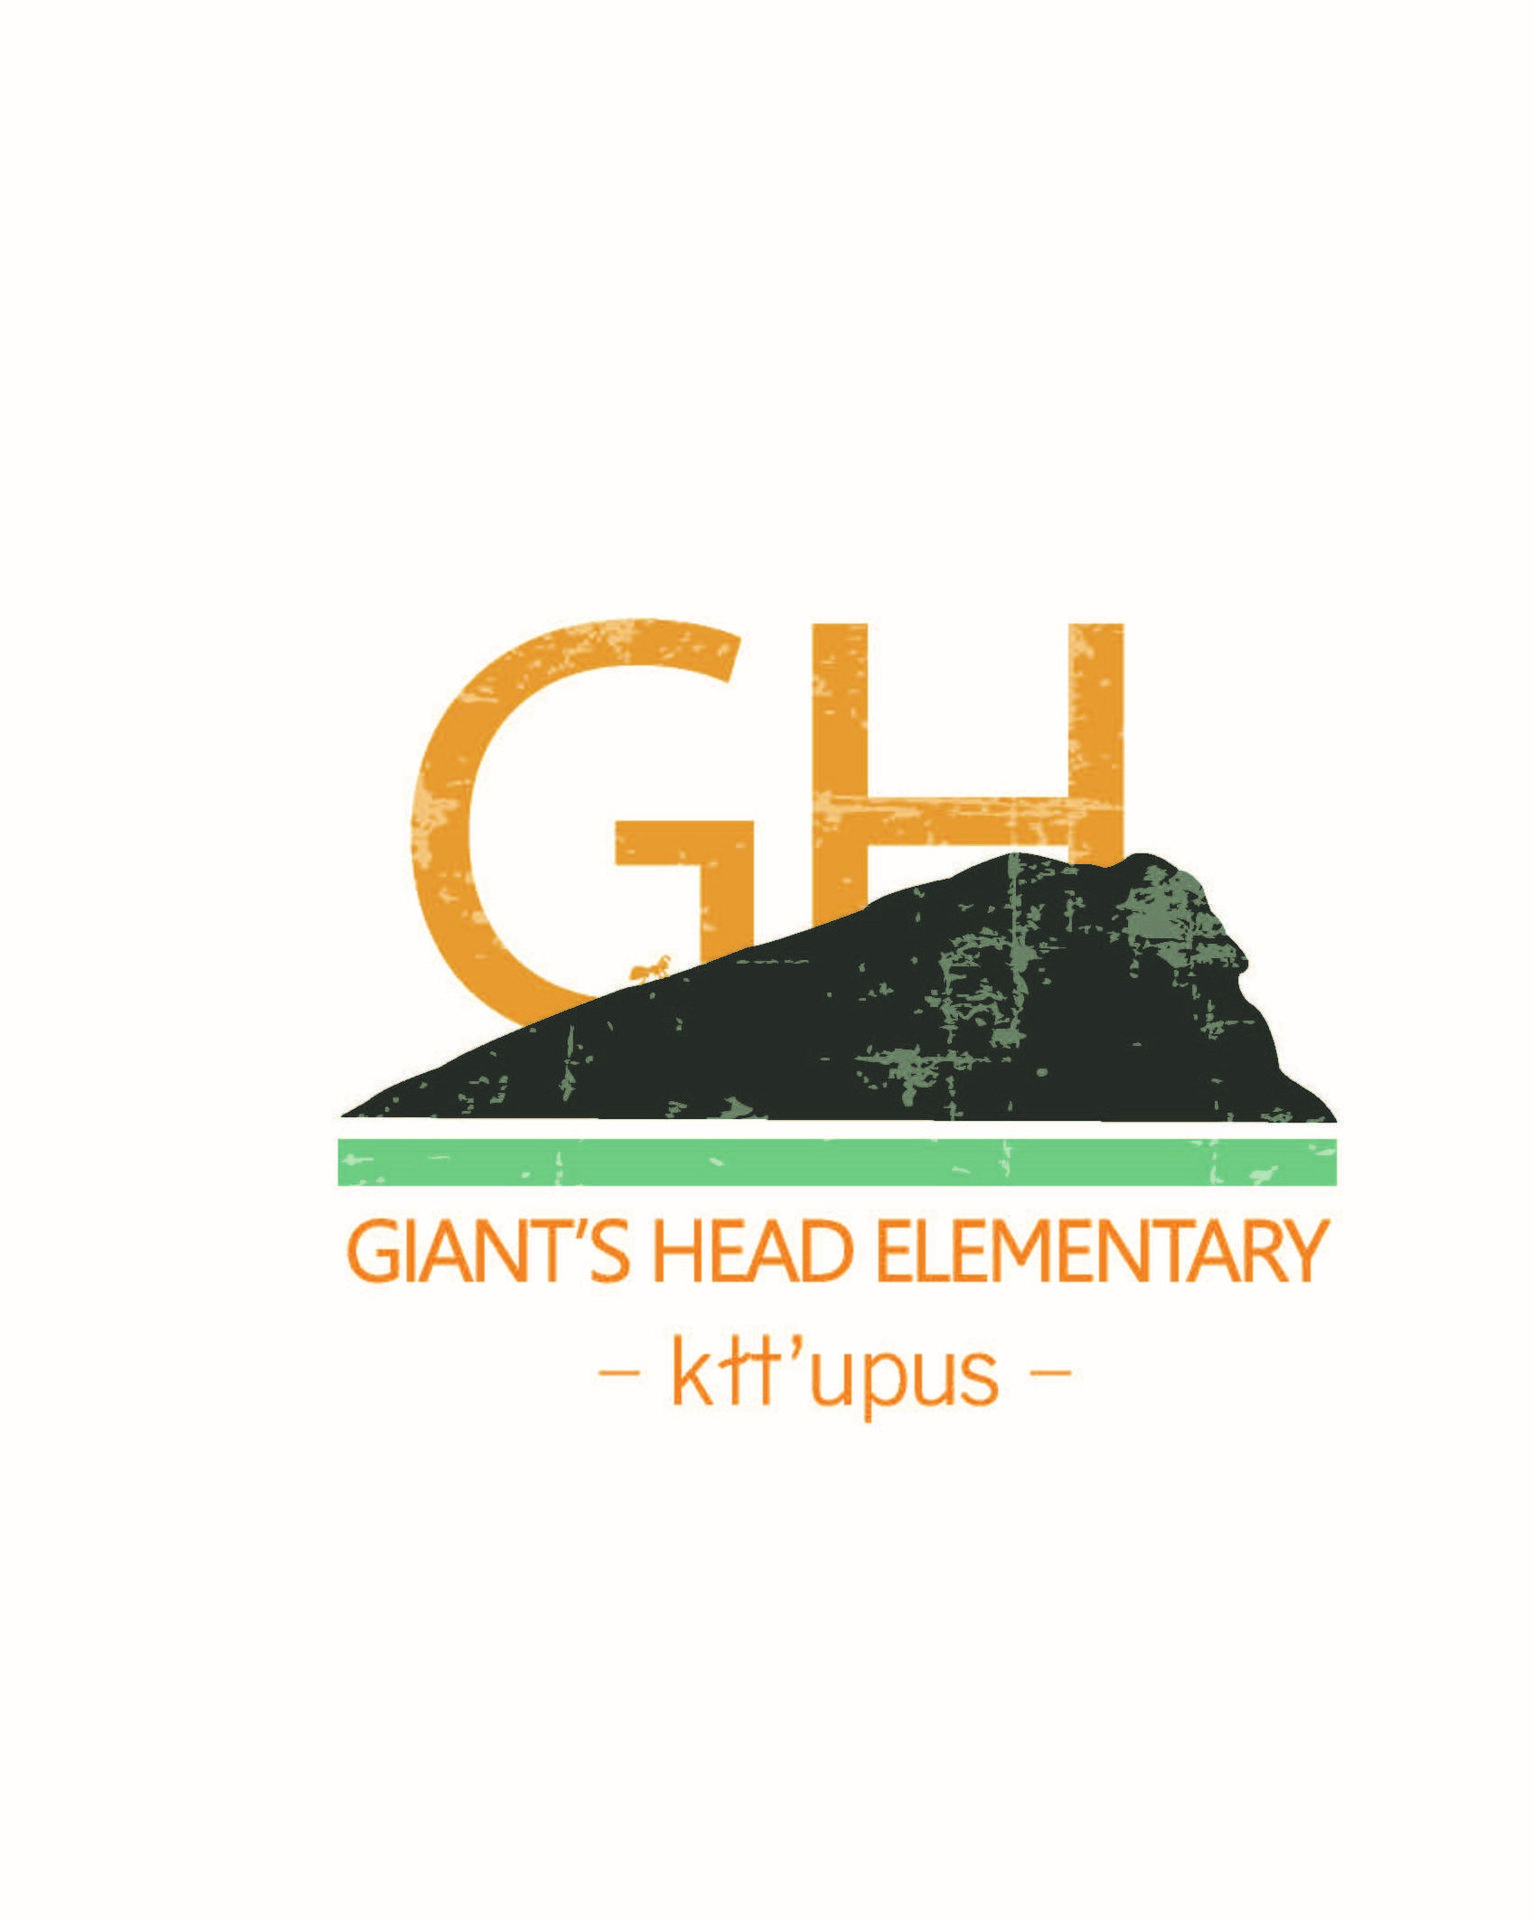 Giant's Head logo